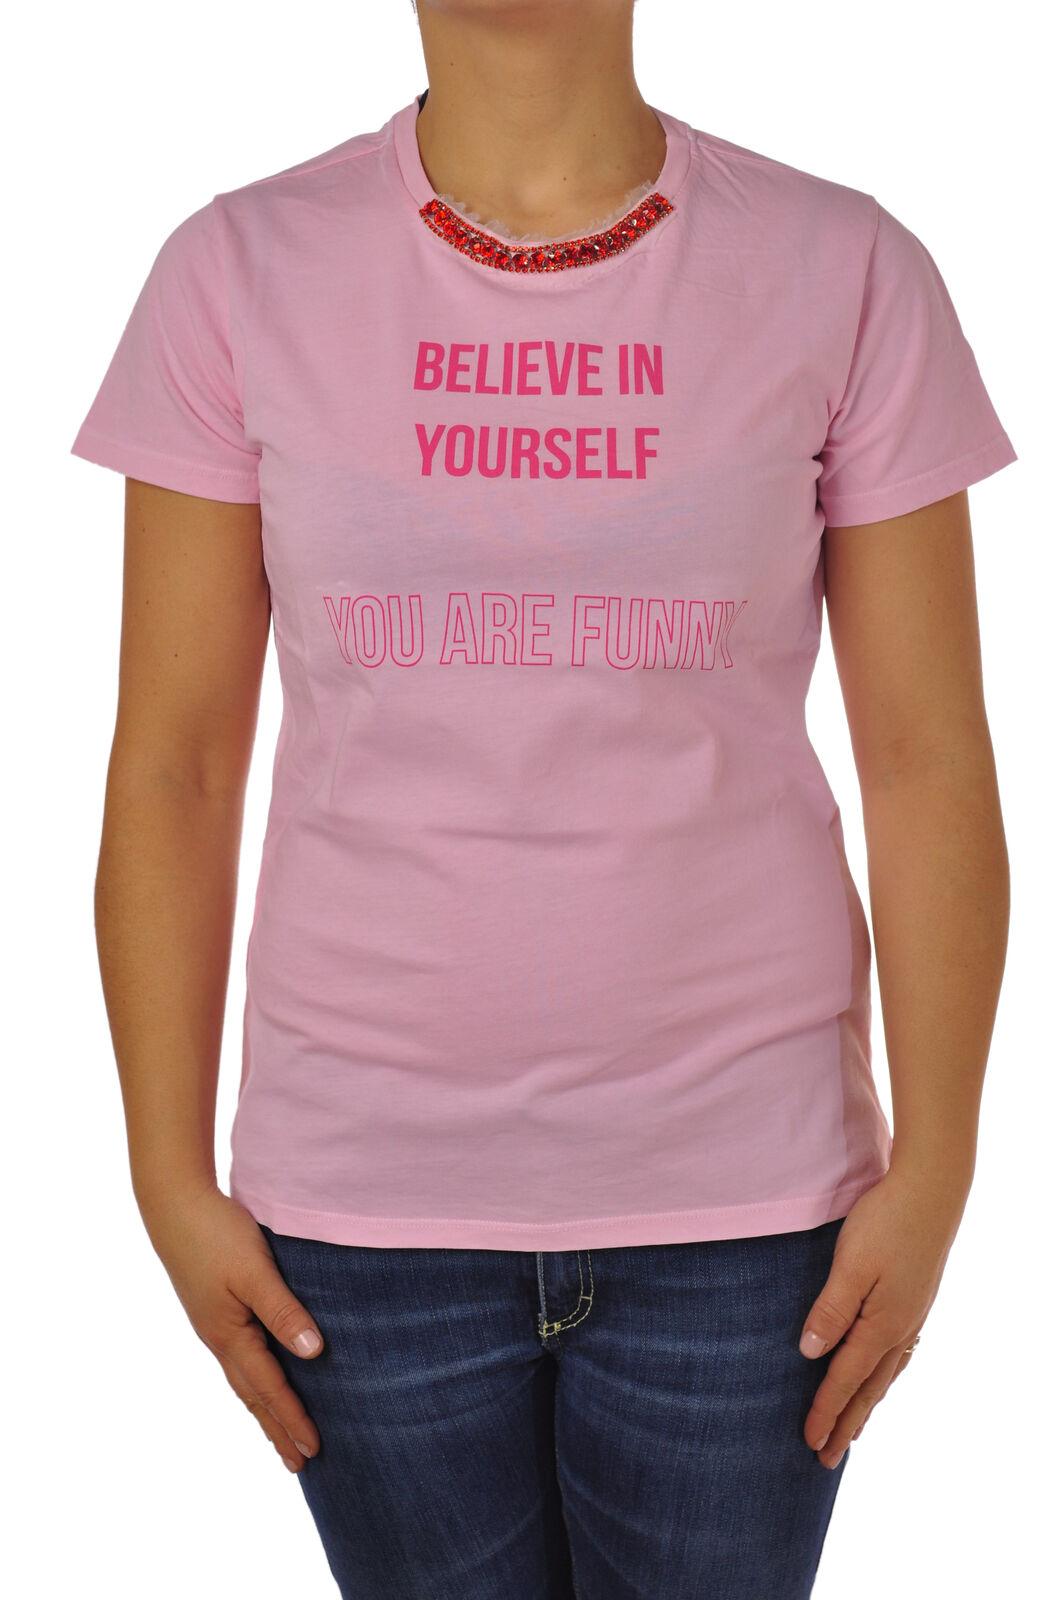 Pinko - Topwear-T-shirts - Frau - pink - 4775813F181018